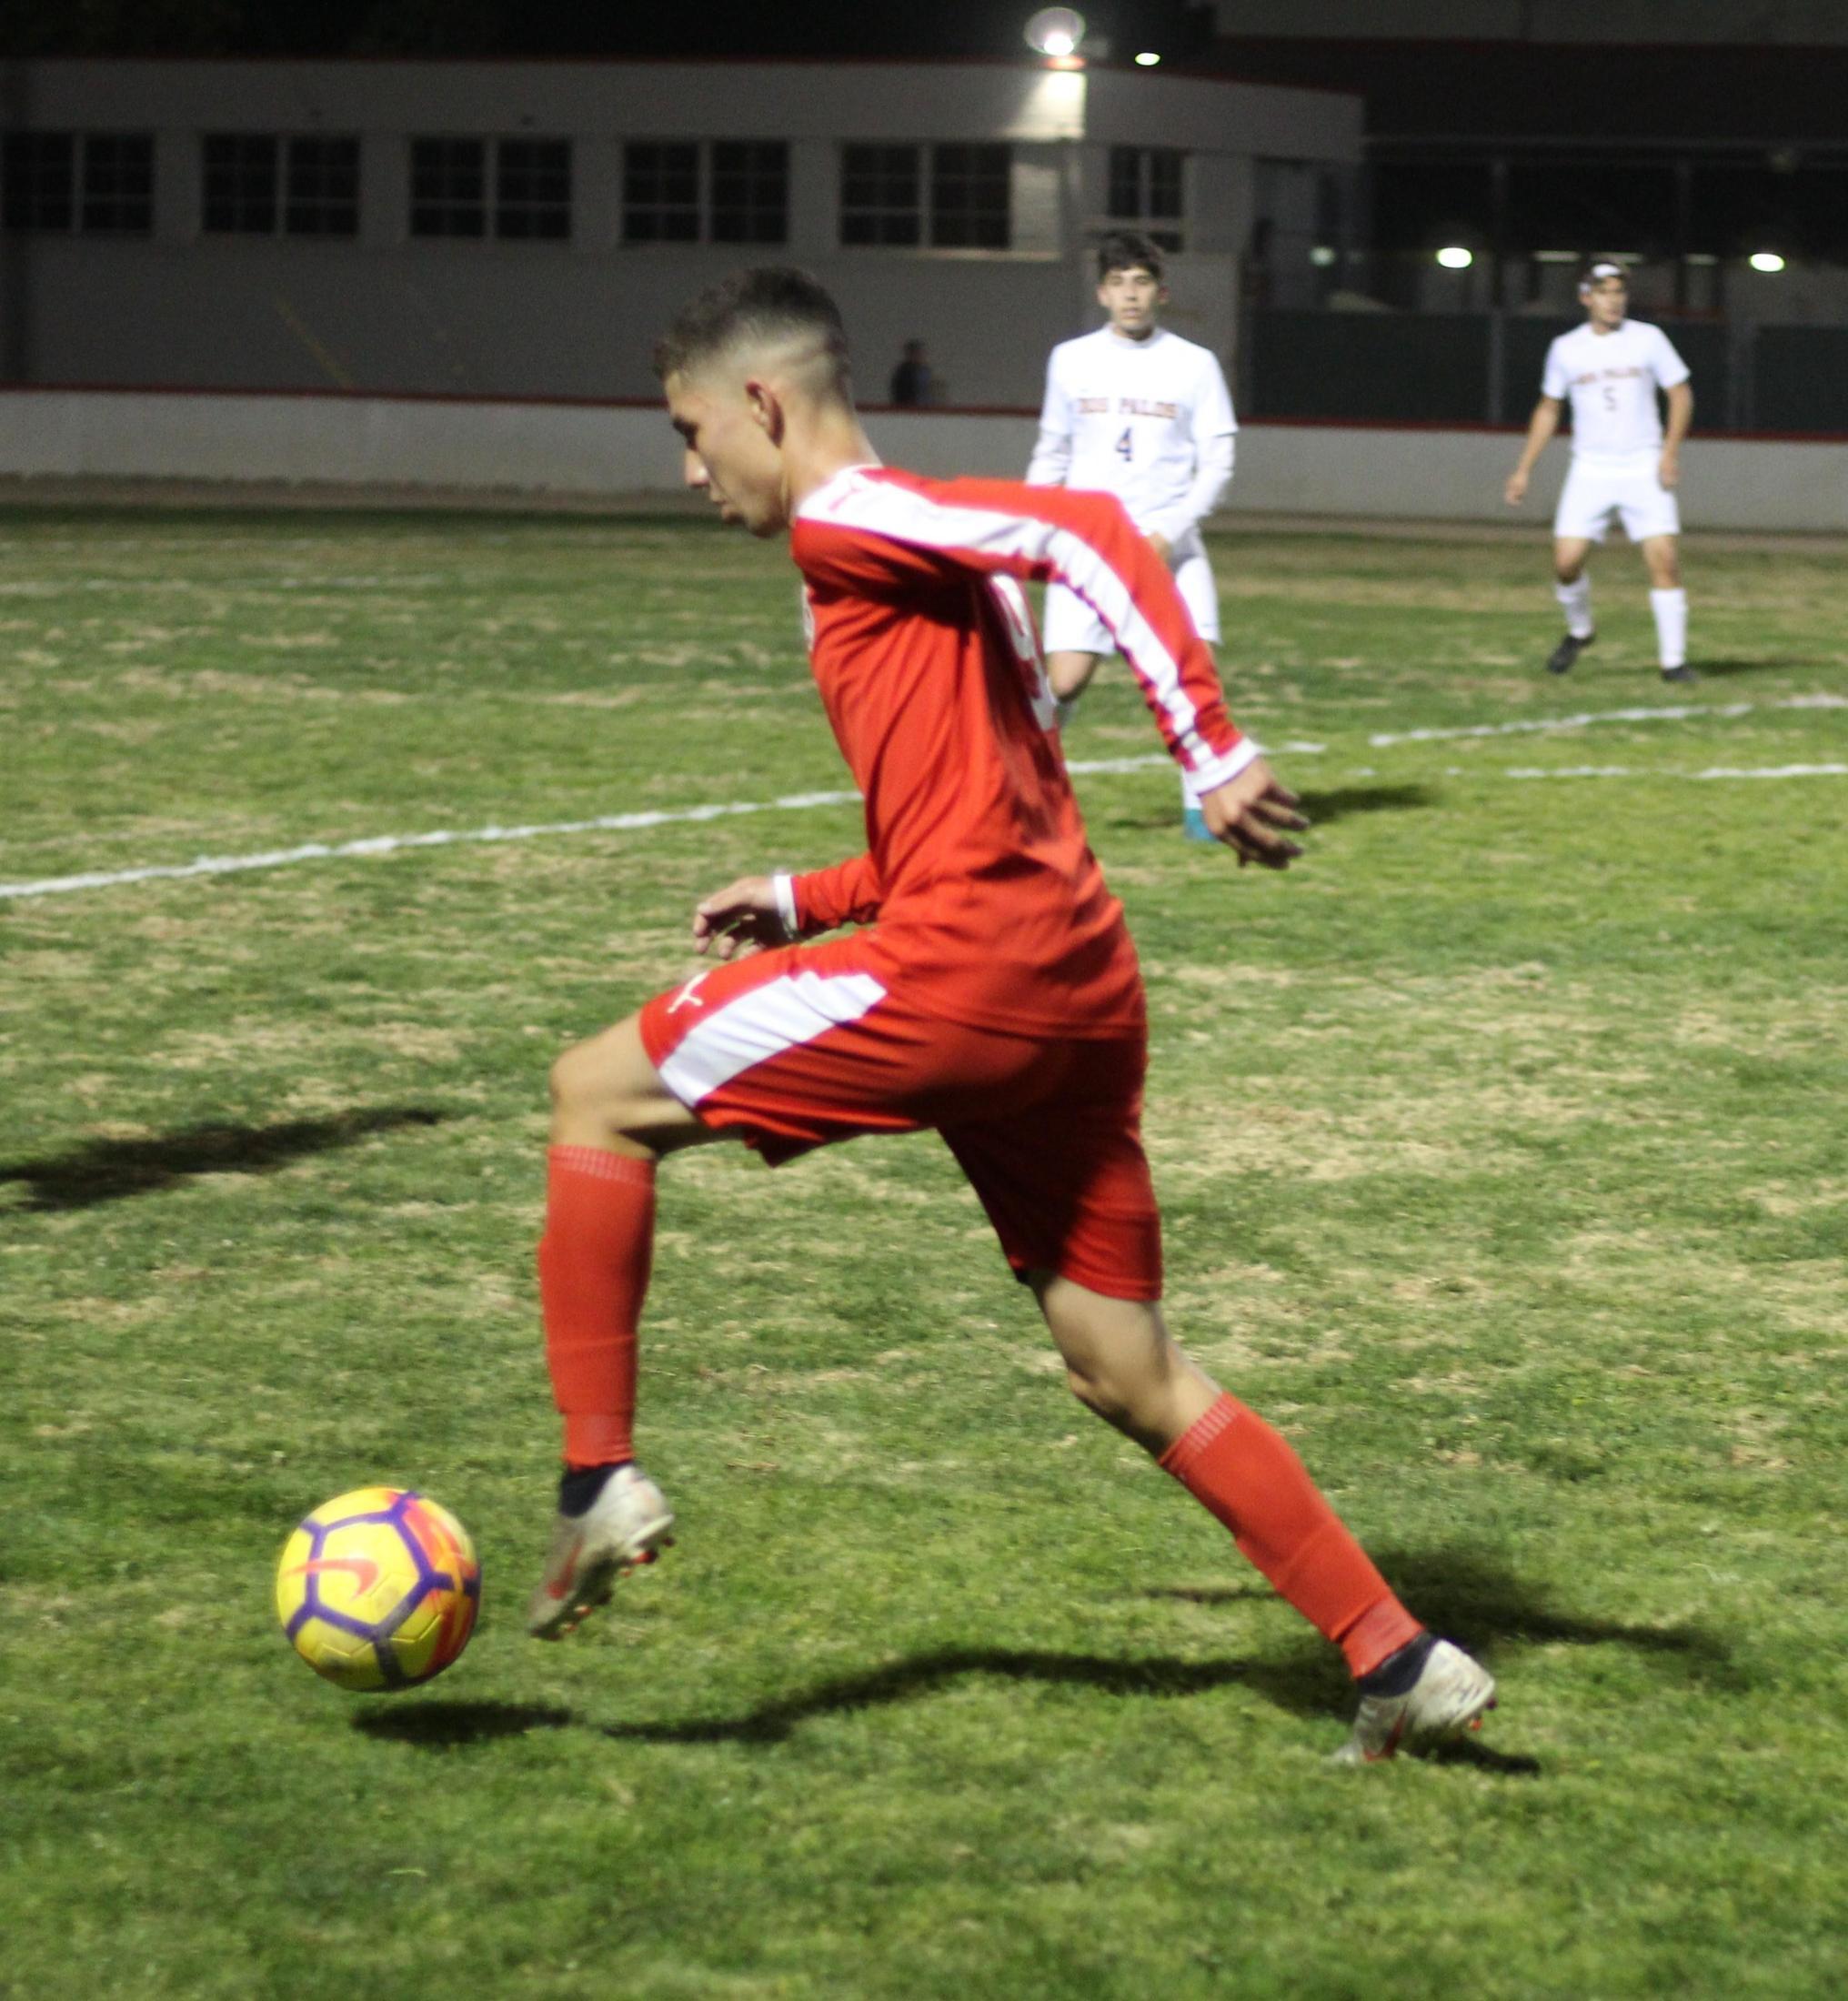 Jose Renteria with the ball